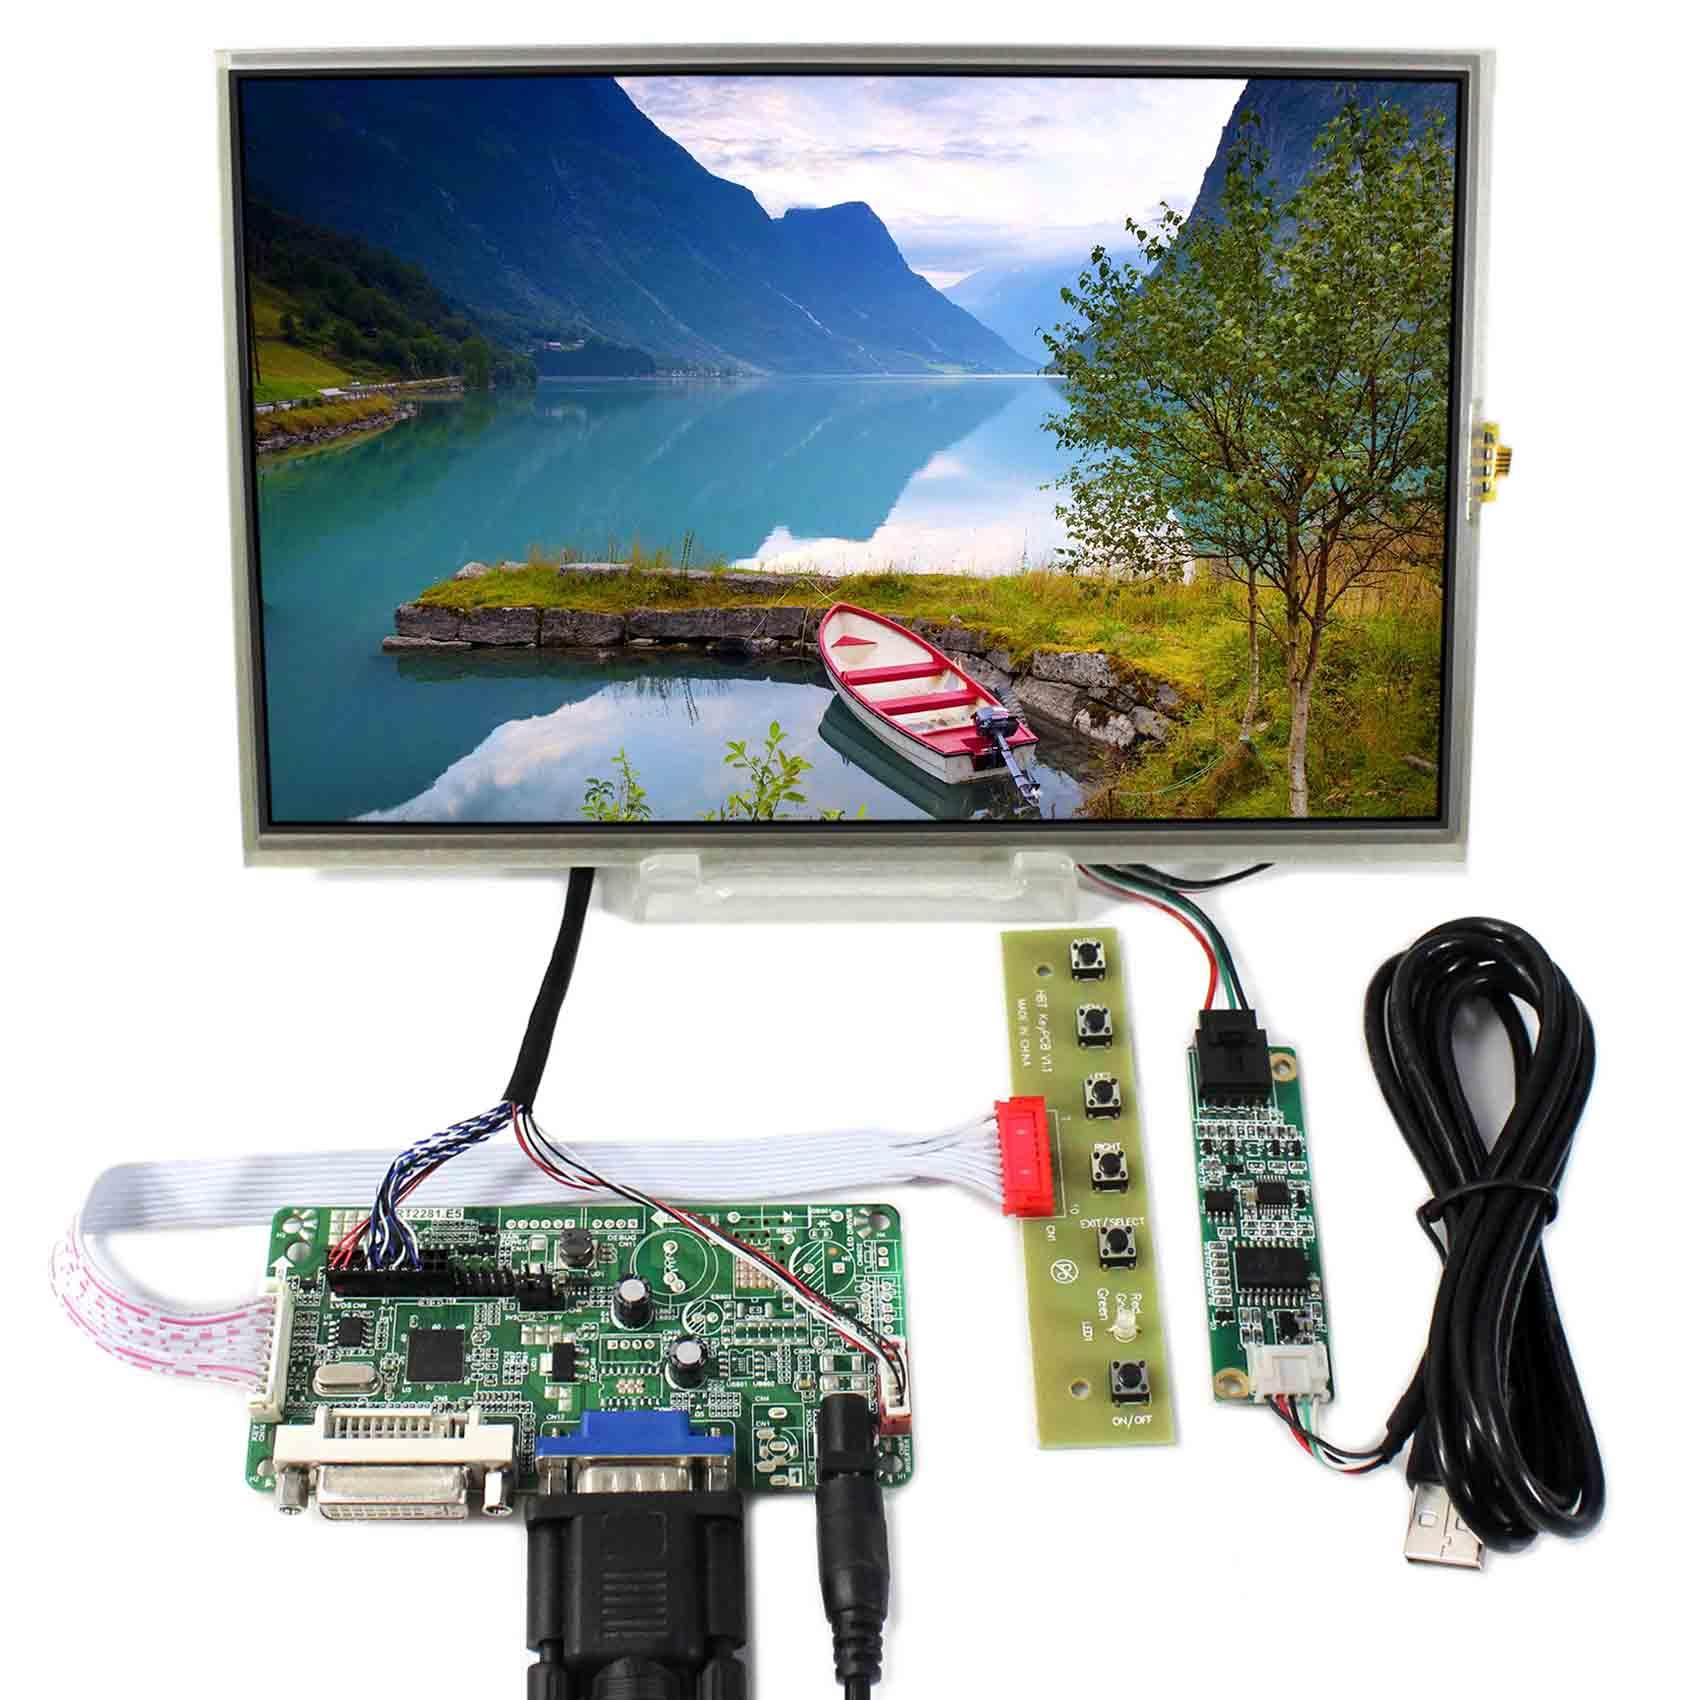 DVI VGA LCD Controller Board With 10.1inch 1280x800 B101EW05 LP101WX1 Touch LCD Screen hdmi dvi vga lcd controller board 10 1inch b101ew05 hsd101pww1 1280 800 lcd panel